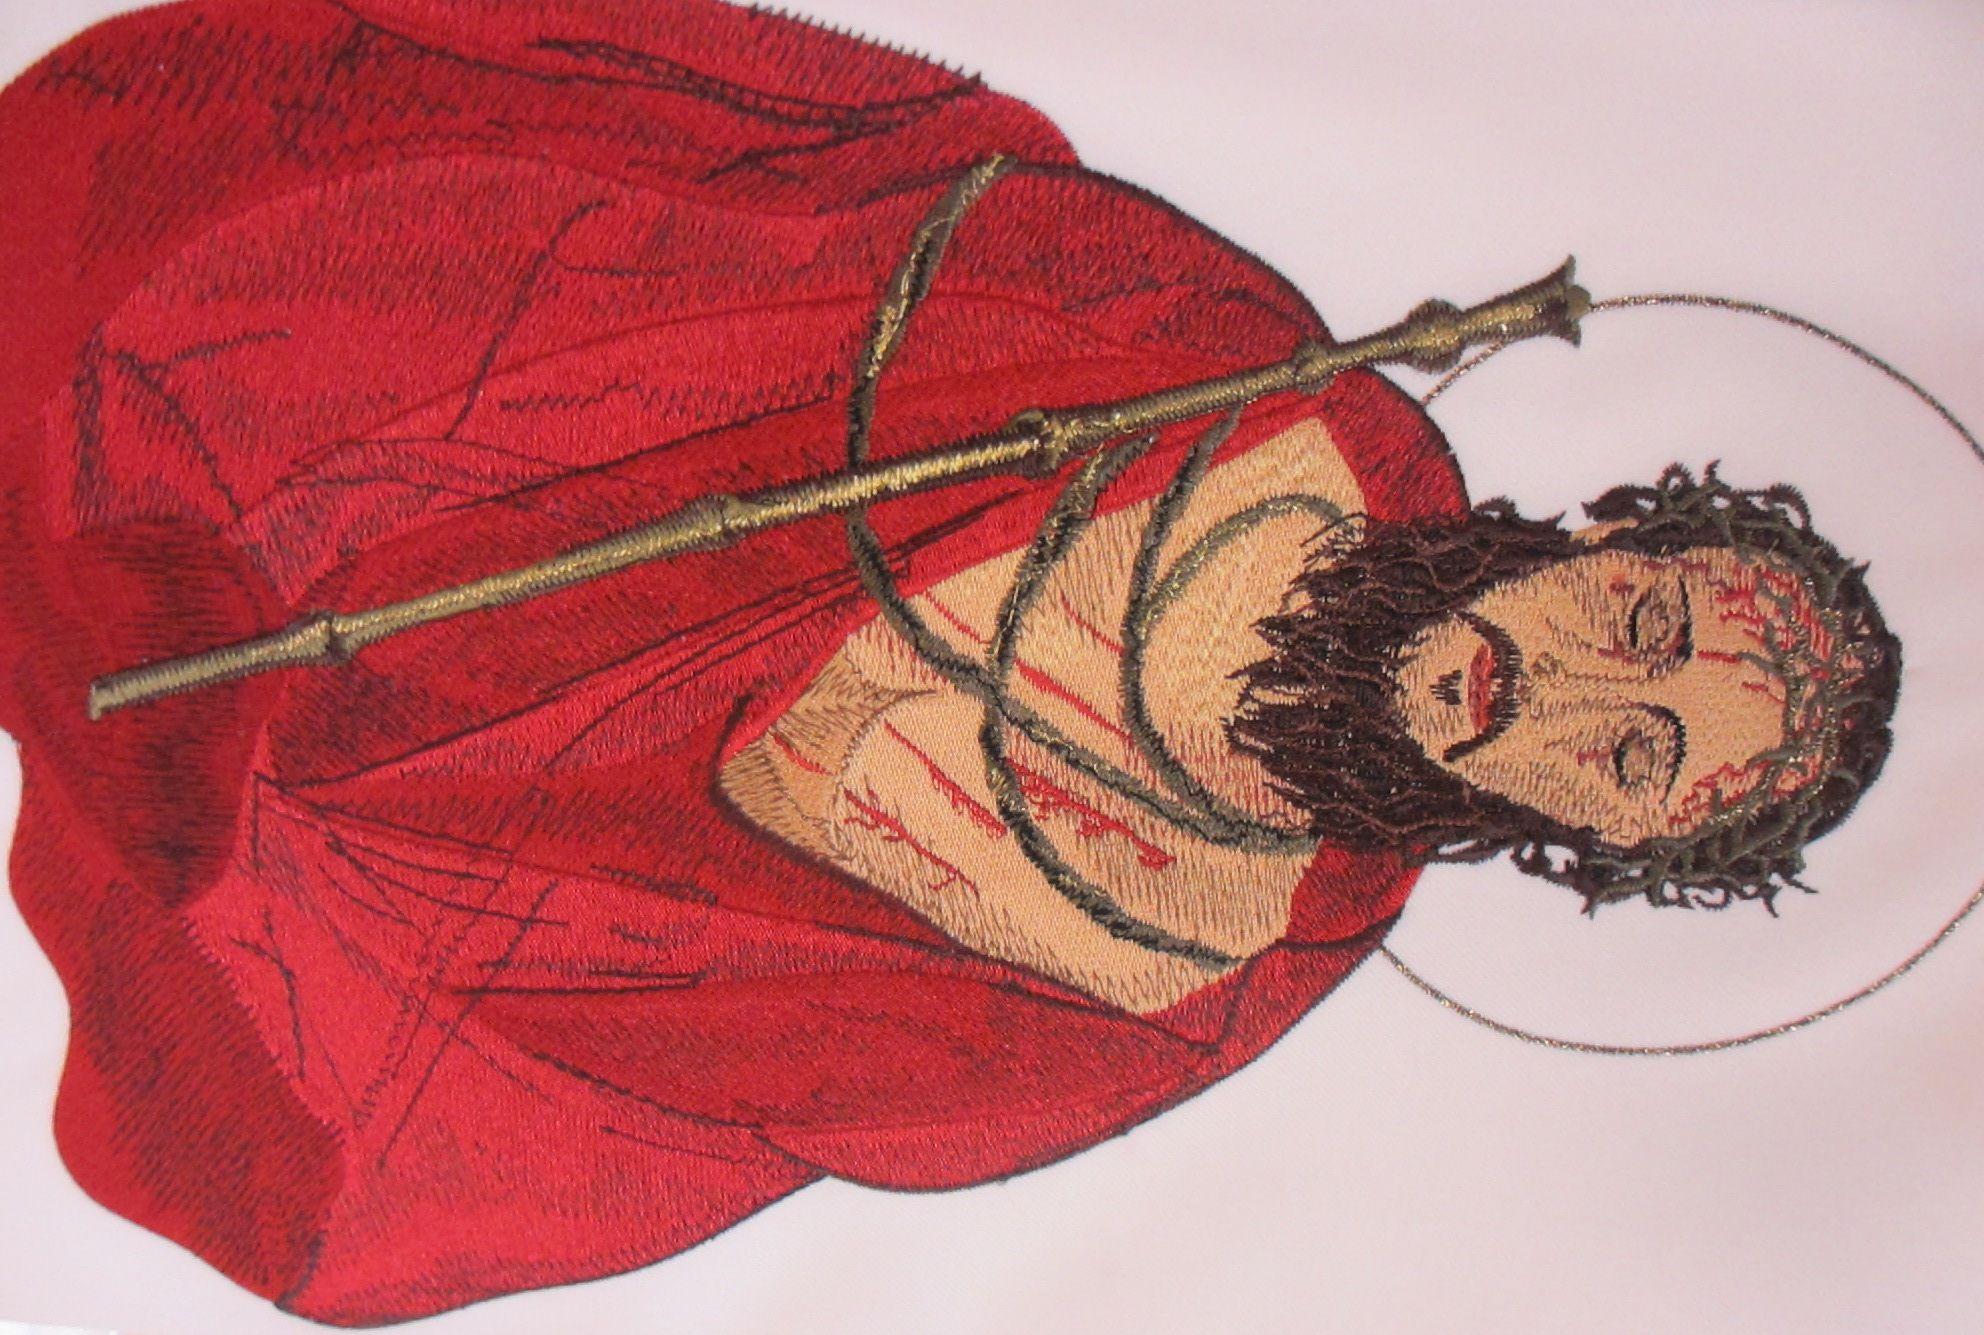 Ecce Homo - Św. Albert Chmielowski - haft